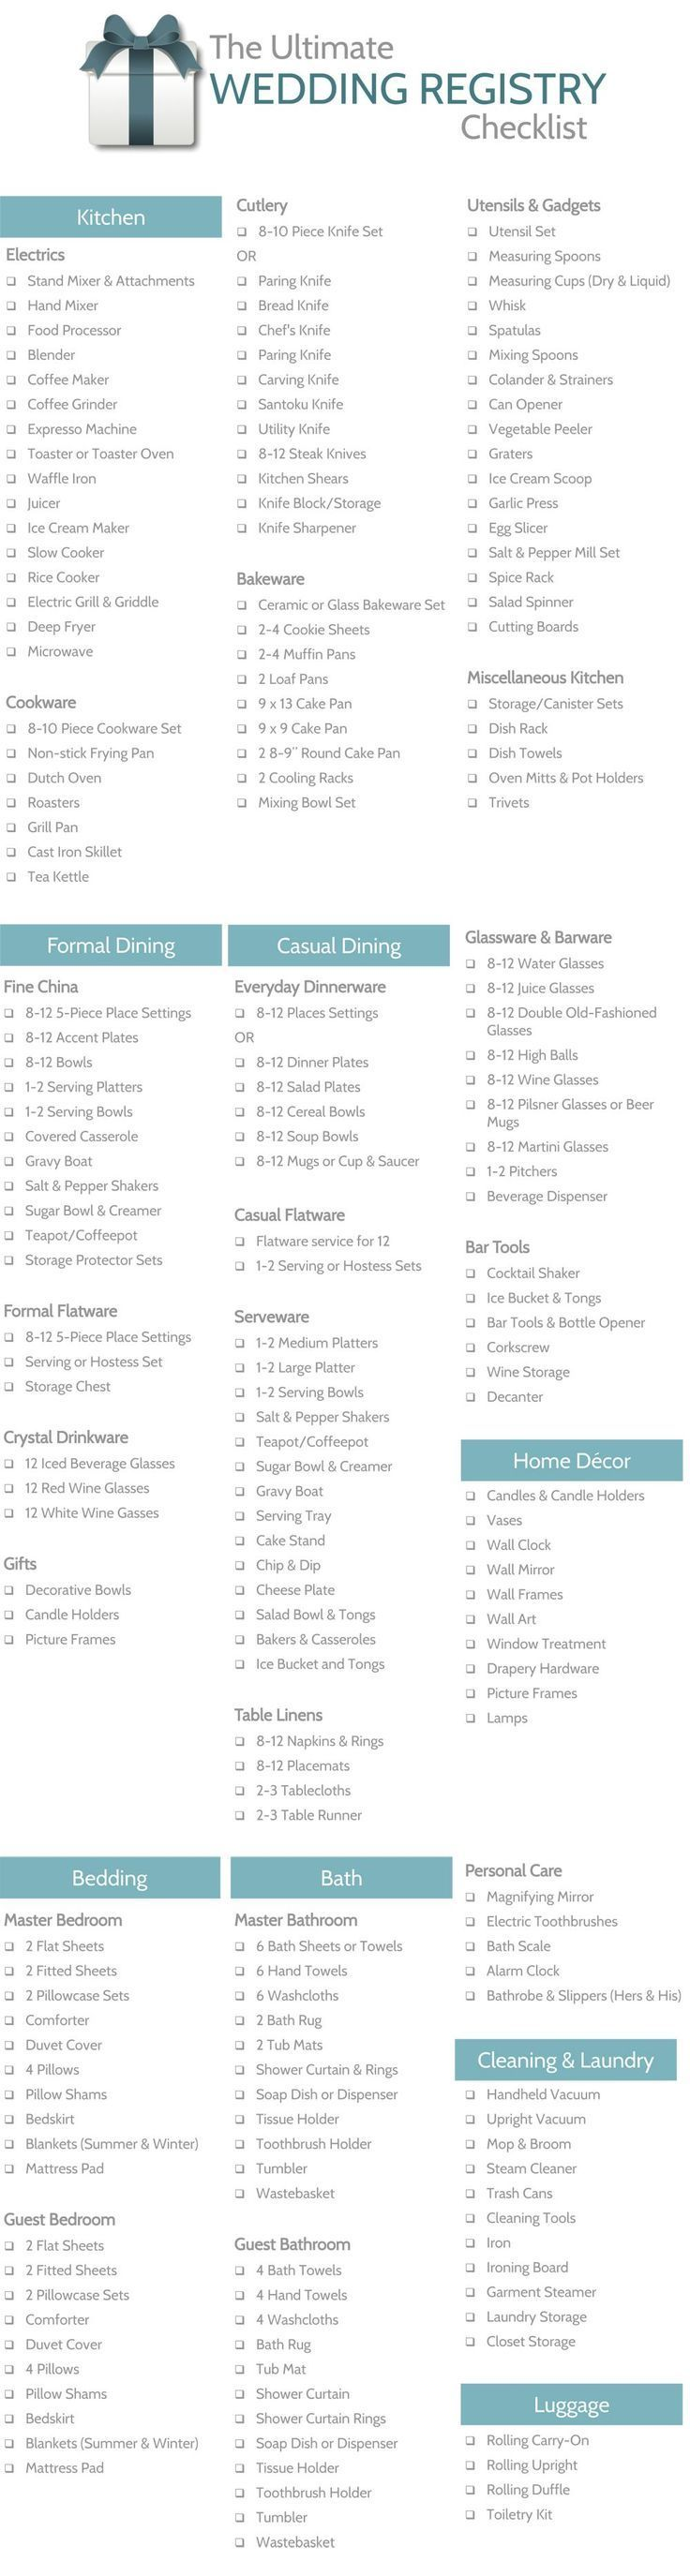 Wedding Registry Checklist Wedding registry checklist